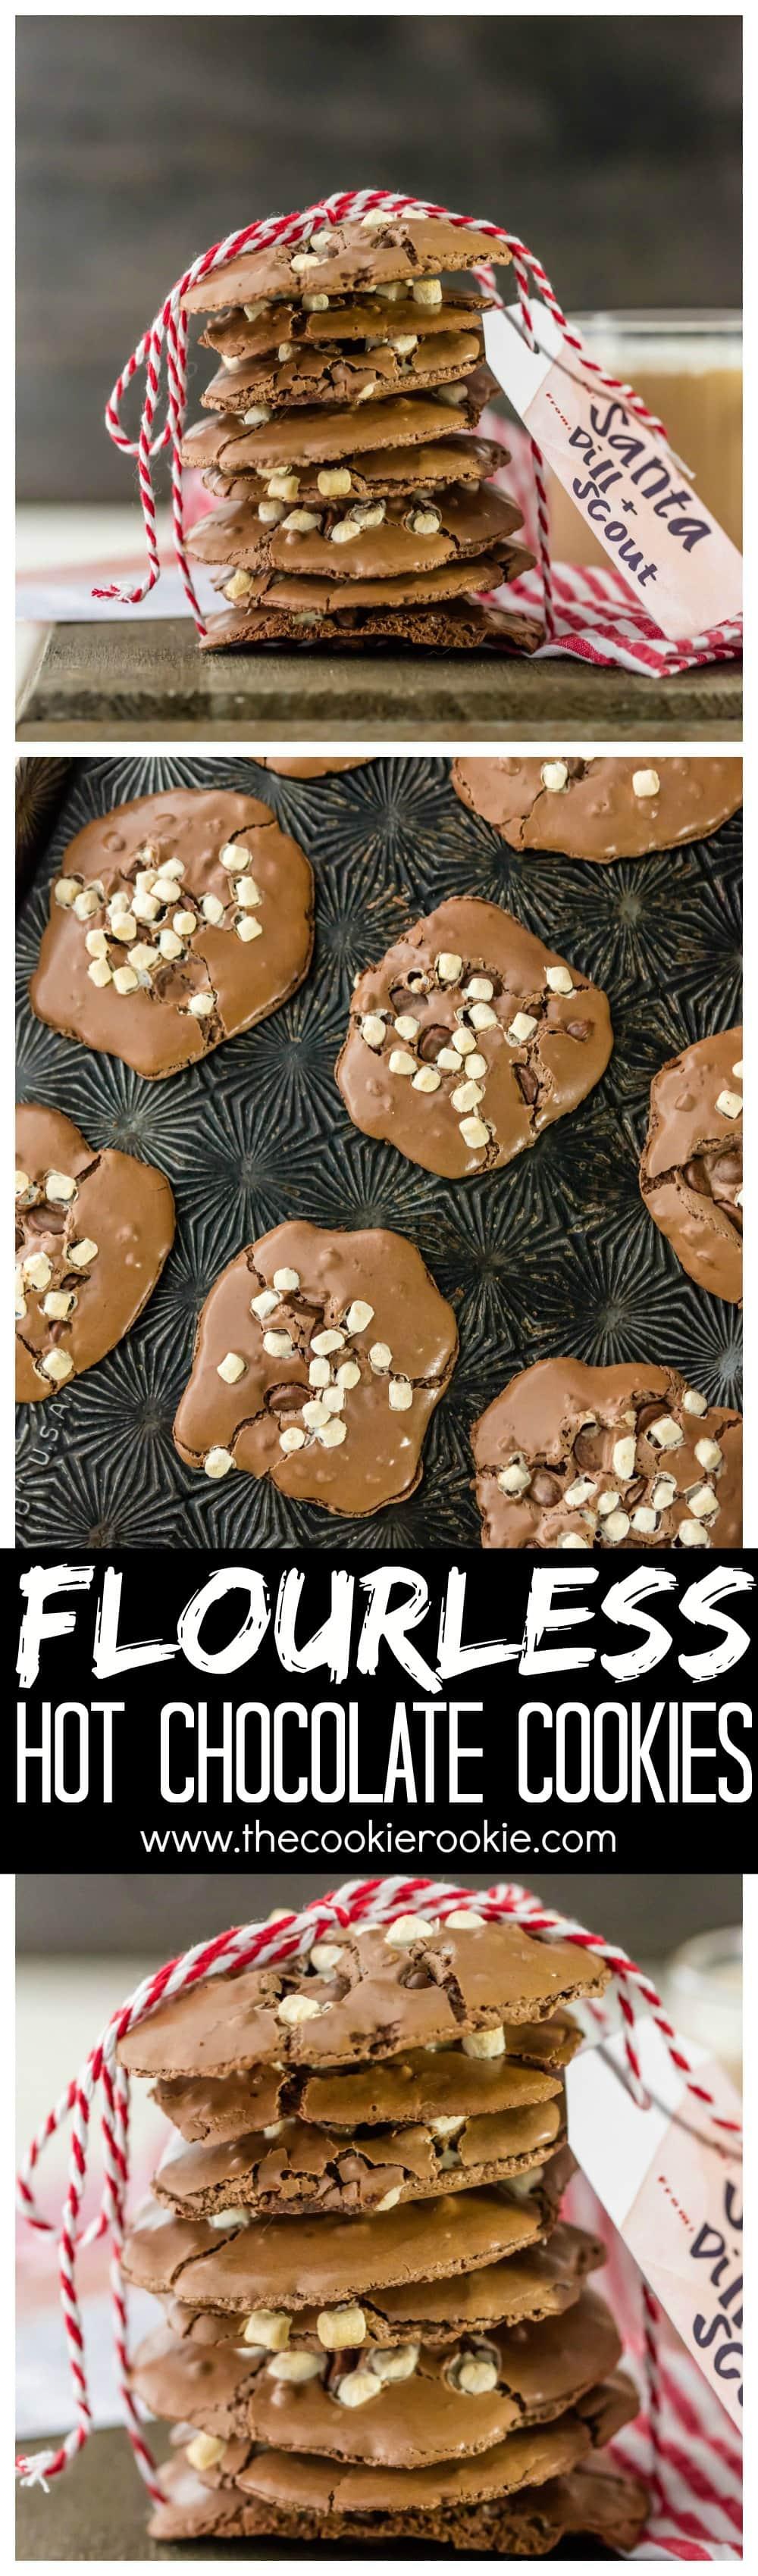 Flourless Hot Chocolate Cookies - The Cookie Rookie